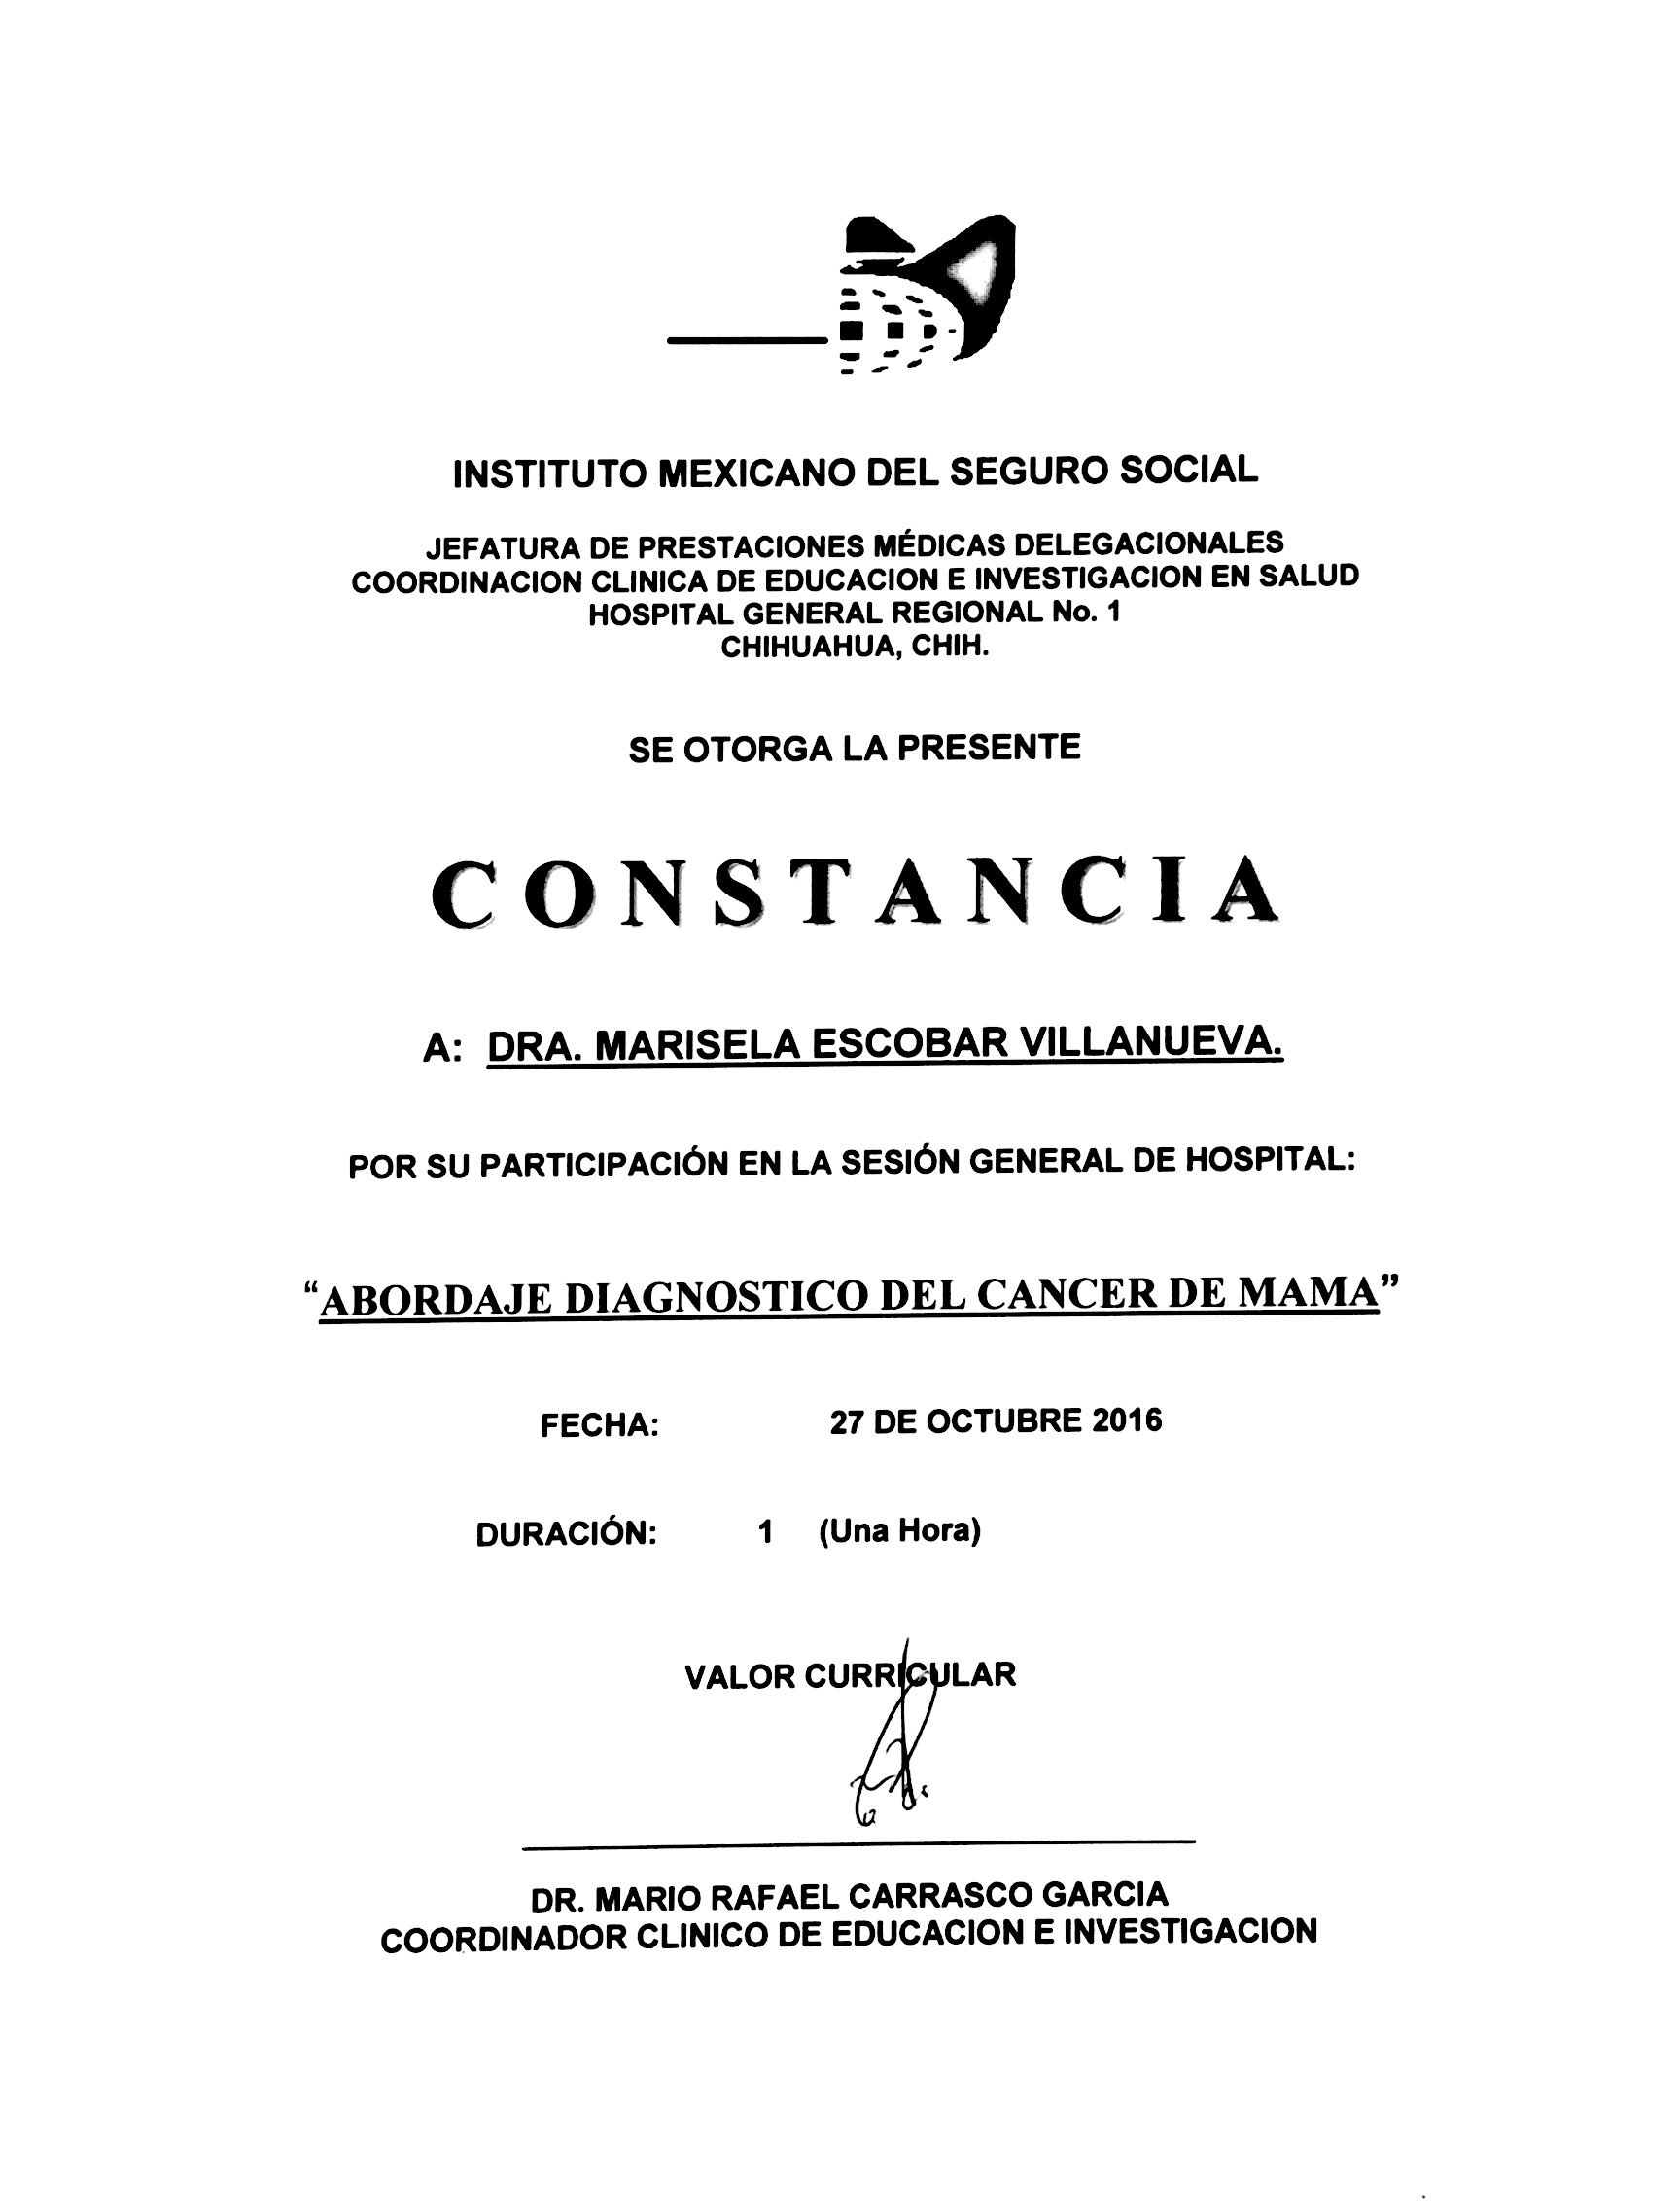 Nuevo doc 2018-02-20 11.21.39_31